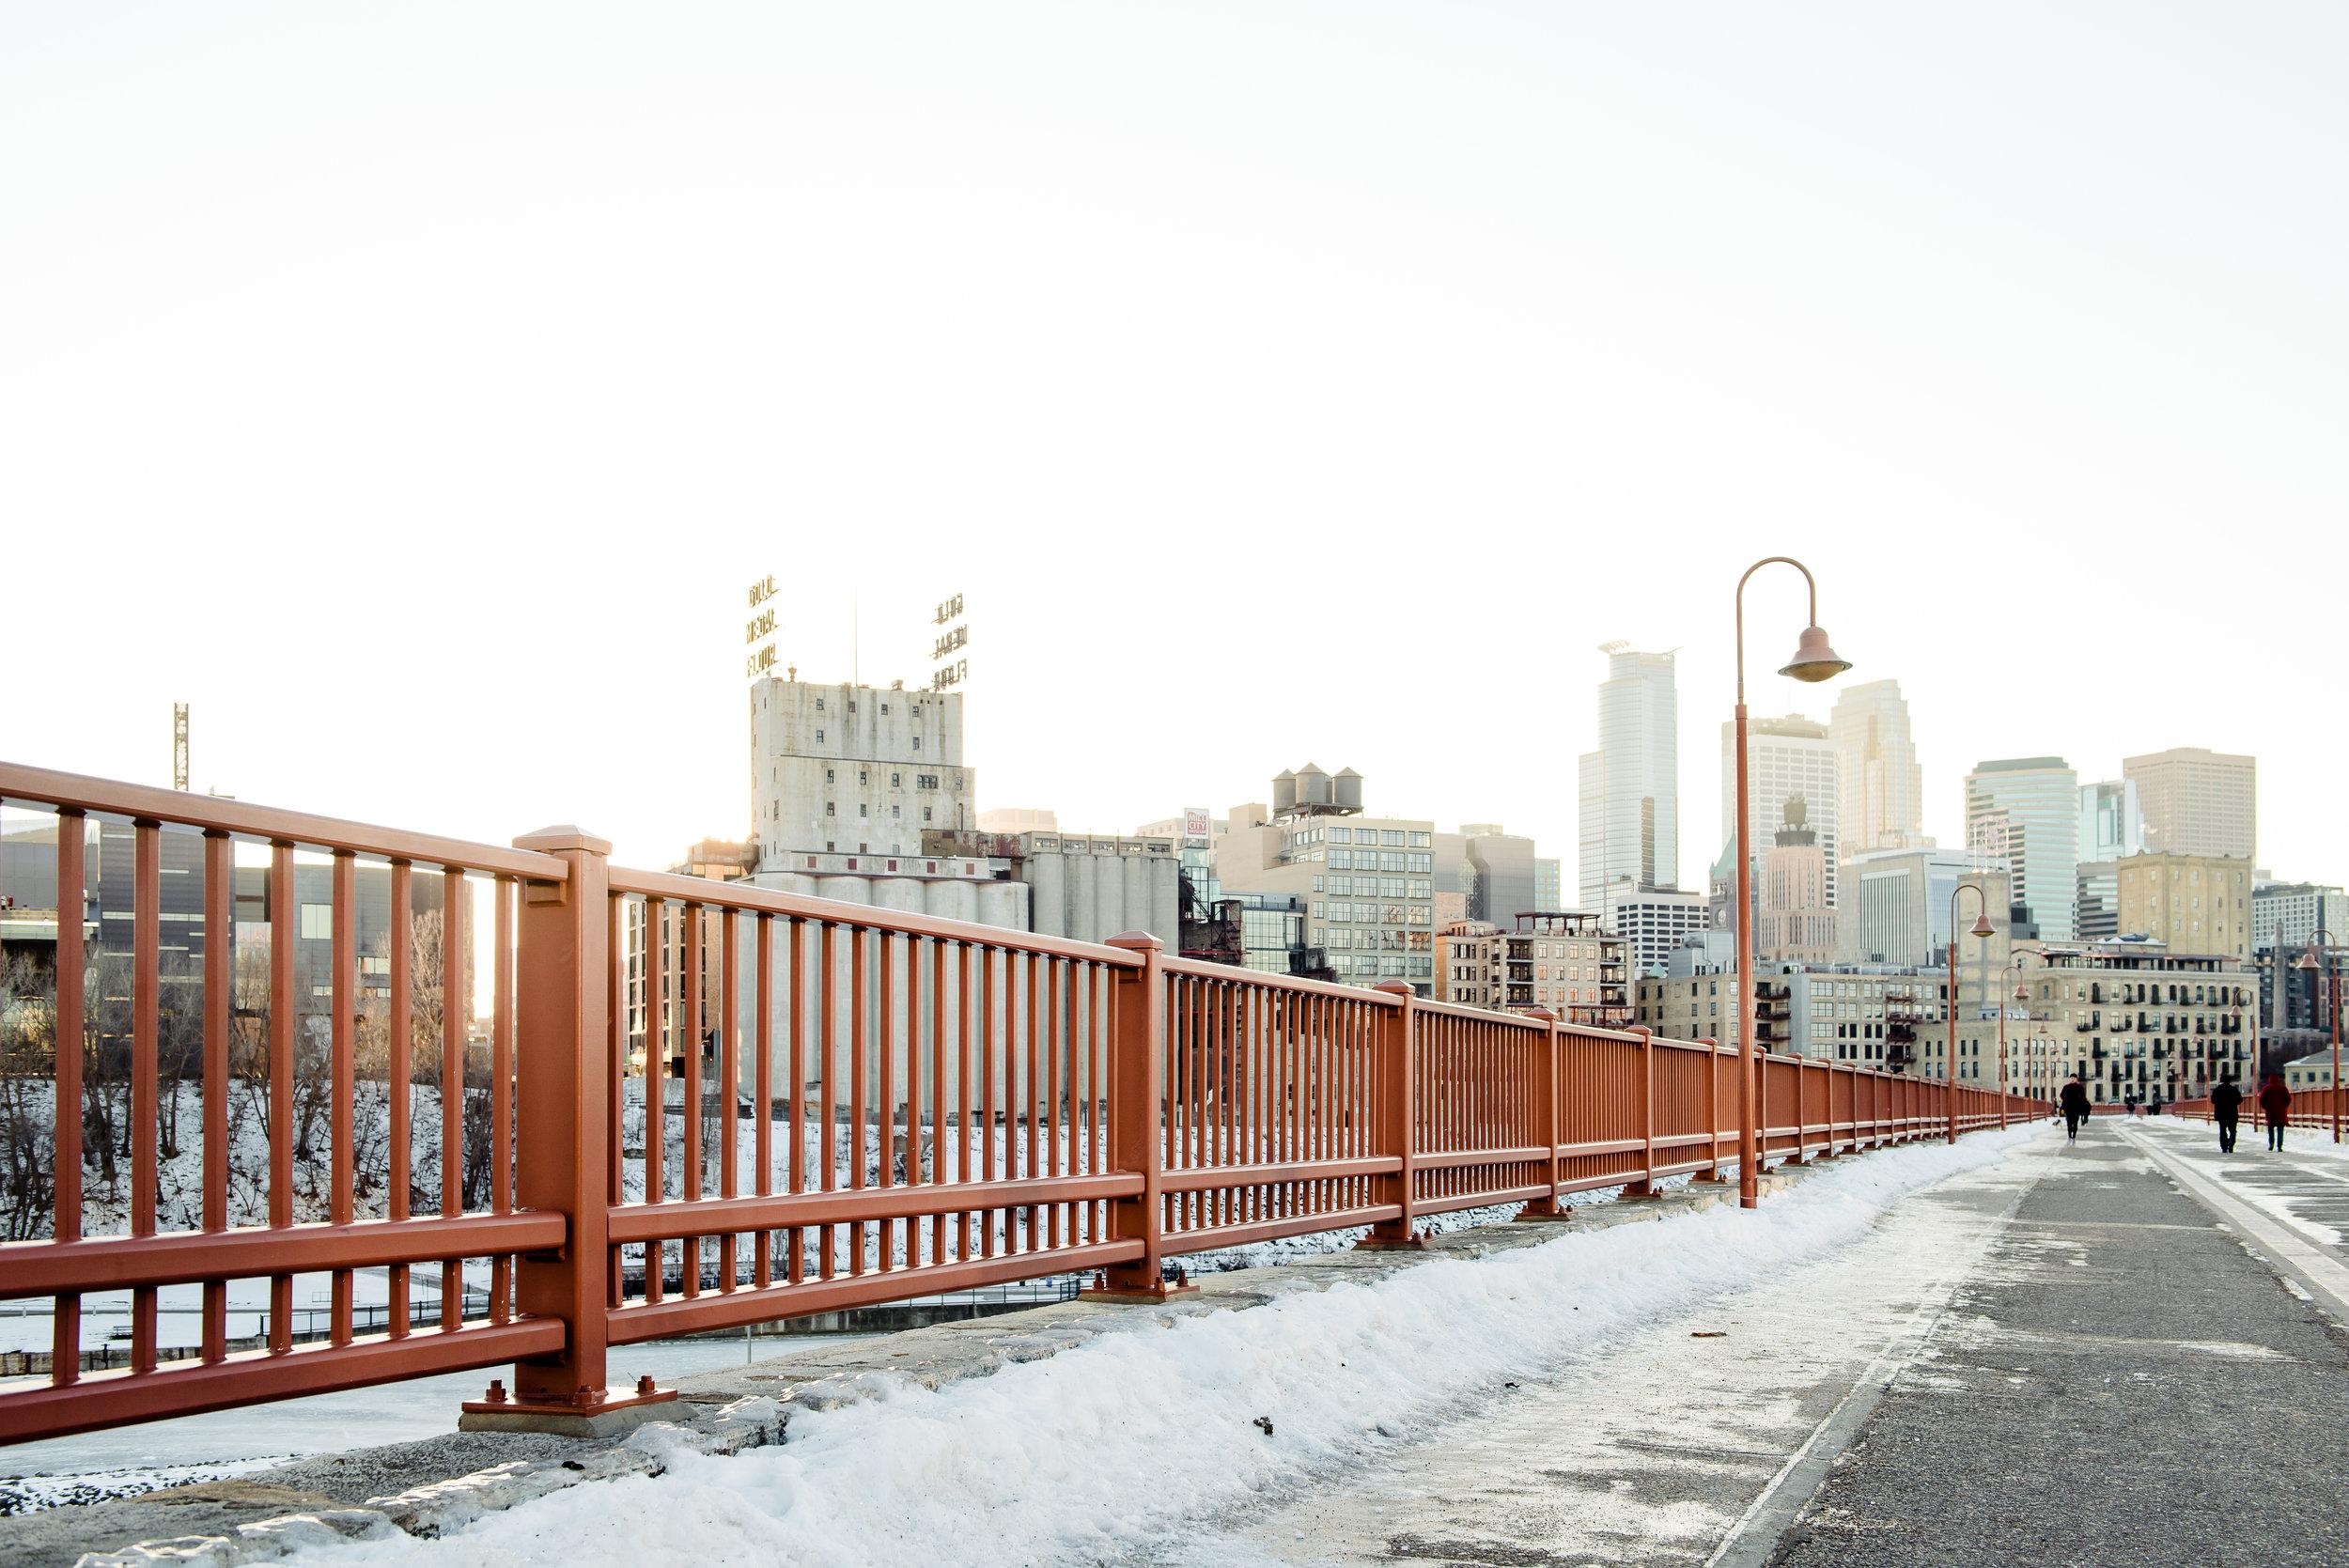 Stone Arch Bridge Minneapolis Skyline at Sunset in Winter